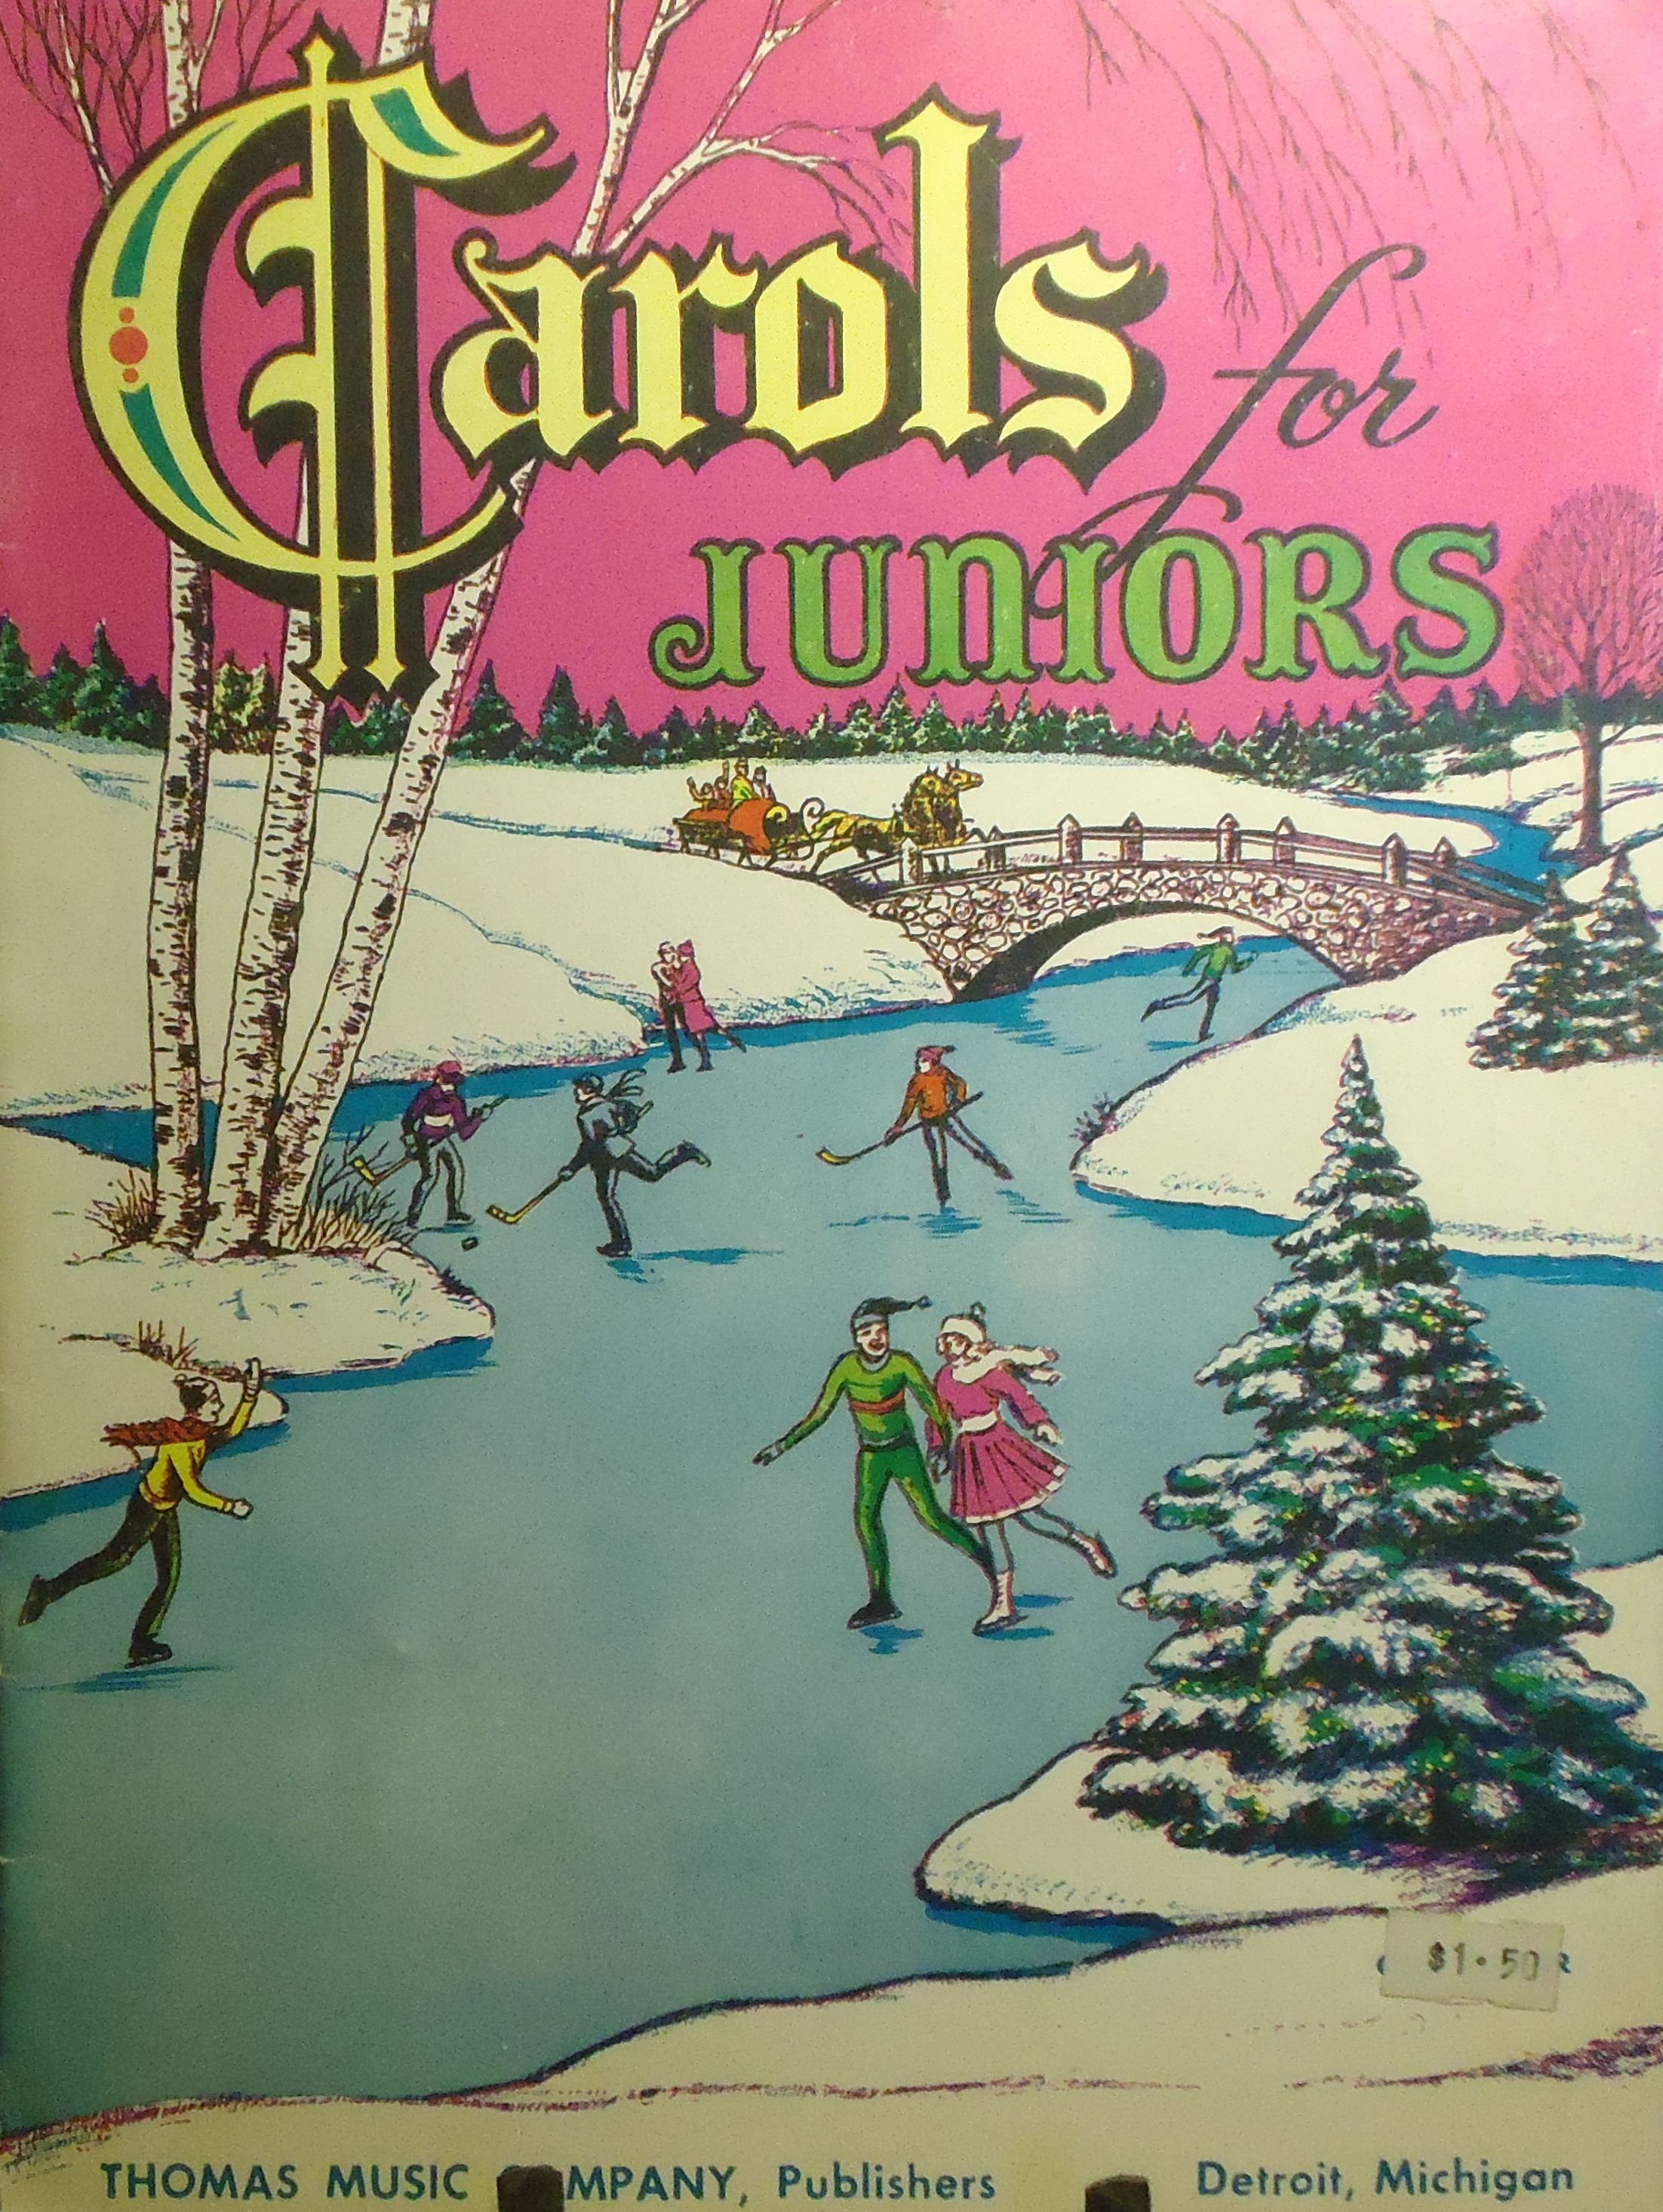 Carols For Juniors - Thomas Music Co. - 1953 - Songbook - Vintage ...